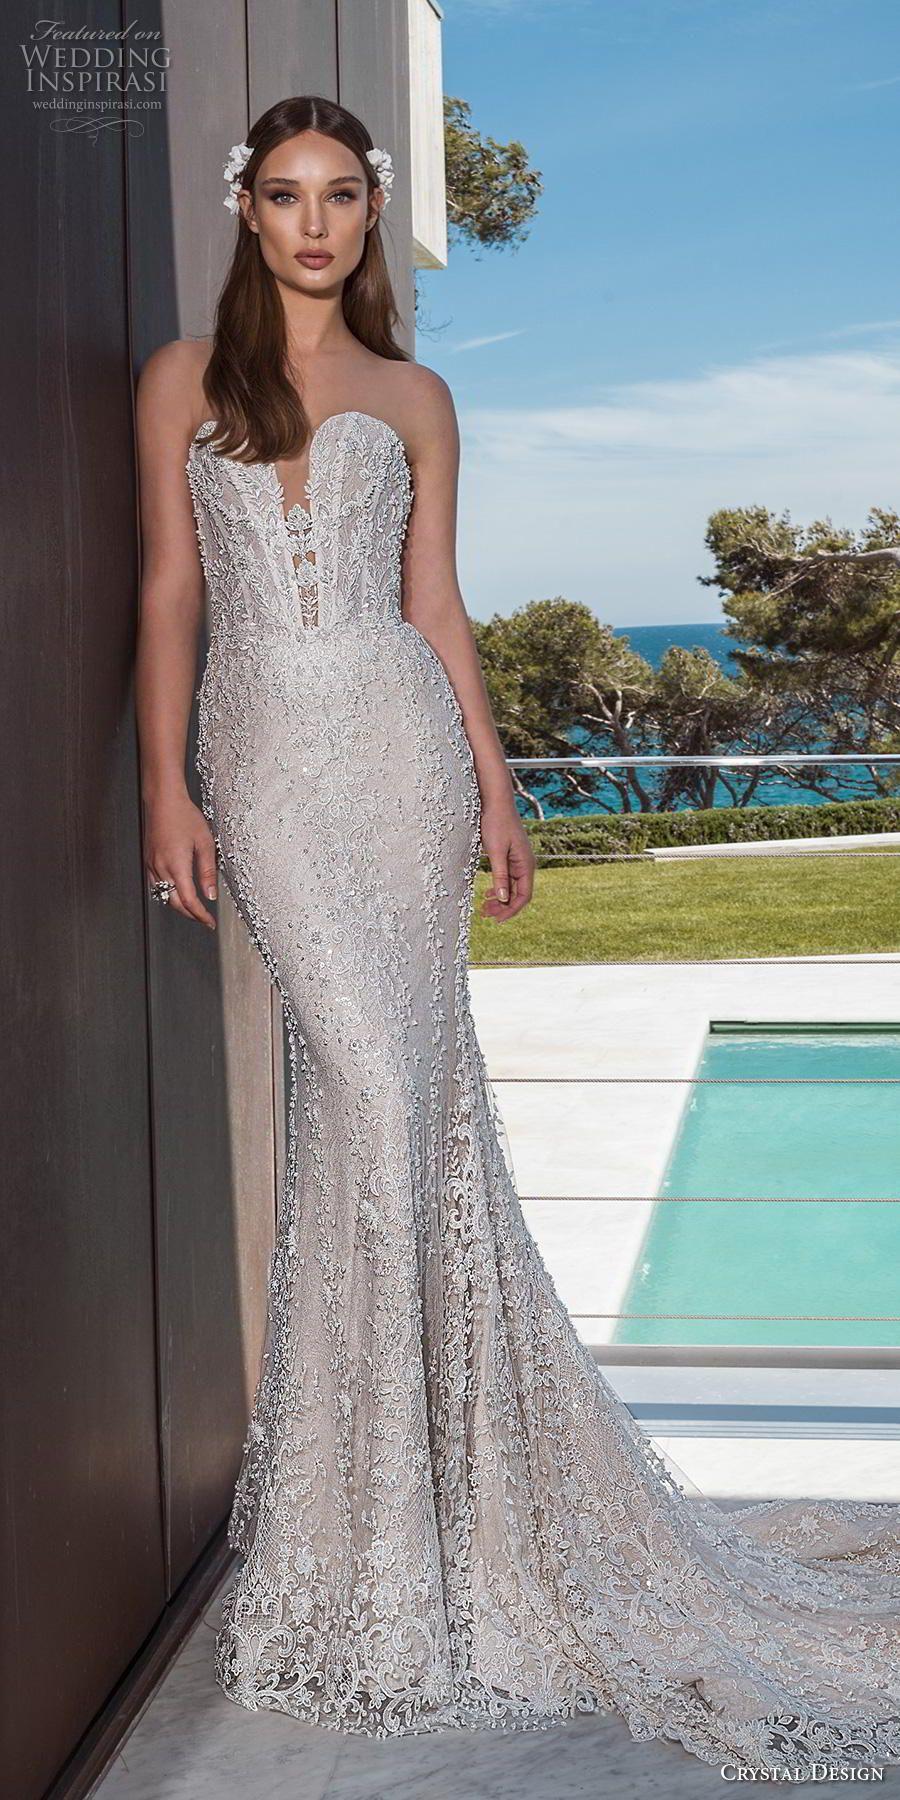 Crystal design wedding dresses u ucthe iconud bridal collection